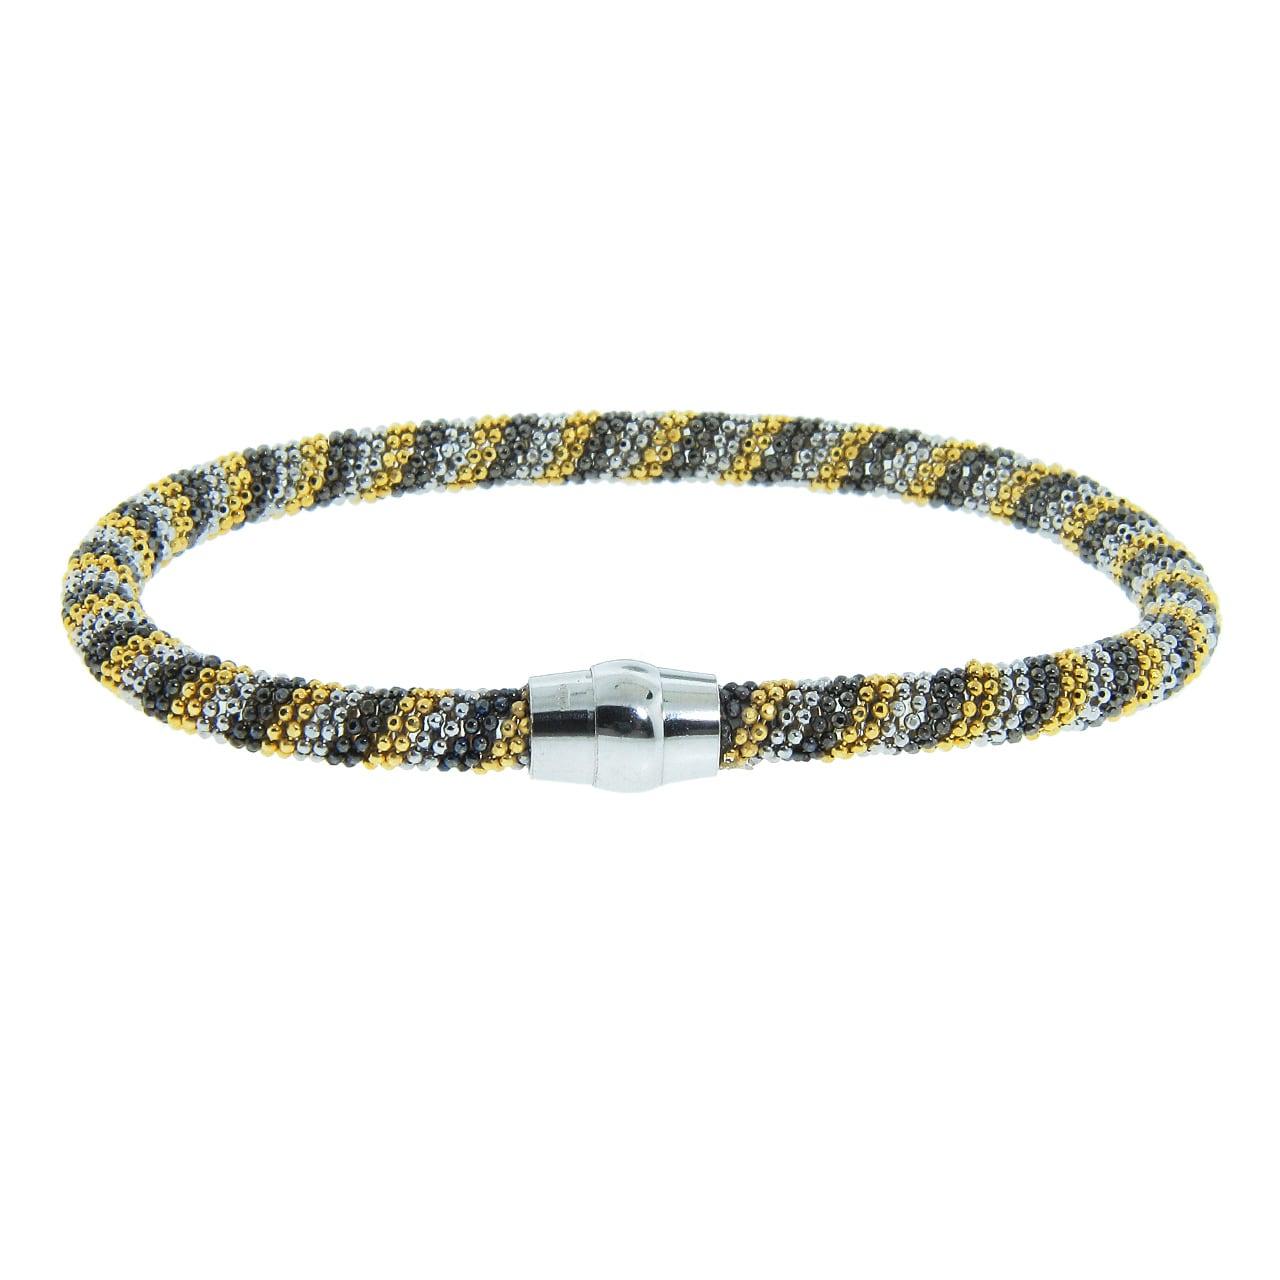 Eternally Haute Tri-color Black Rhodium and Gold over Silver Mesh Bracelet